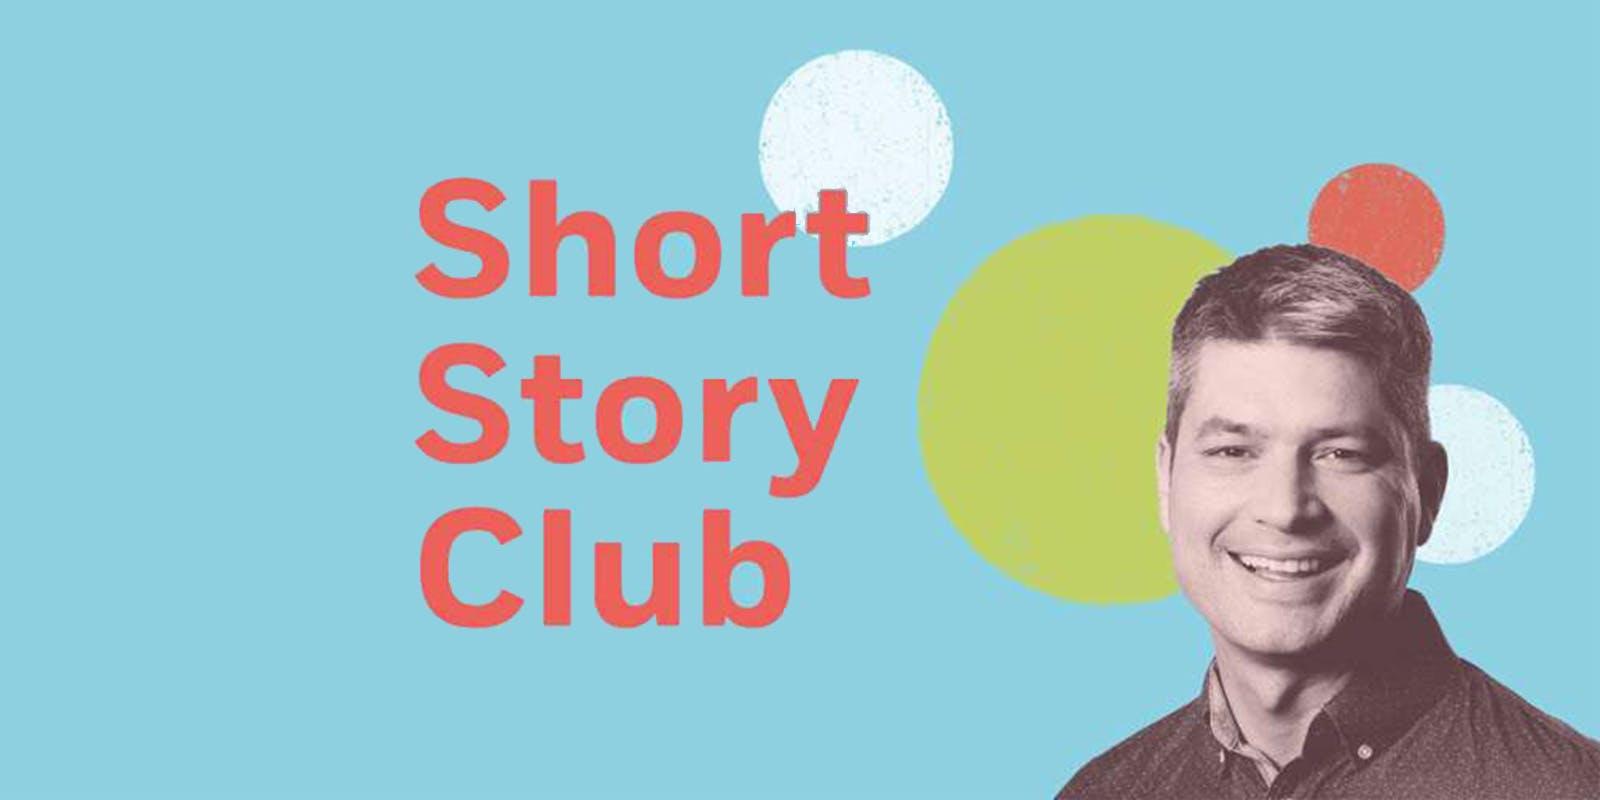 Short story club – 12 July 2018